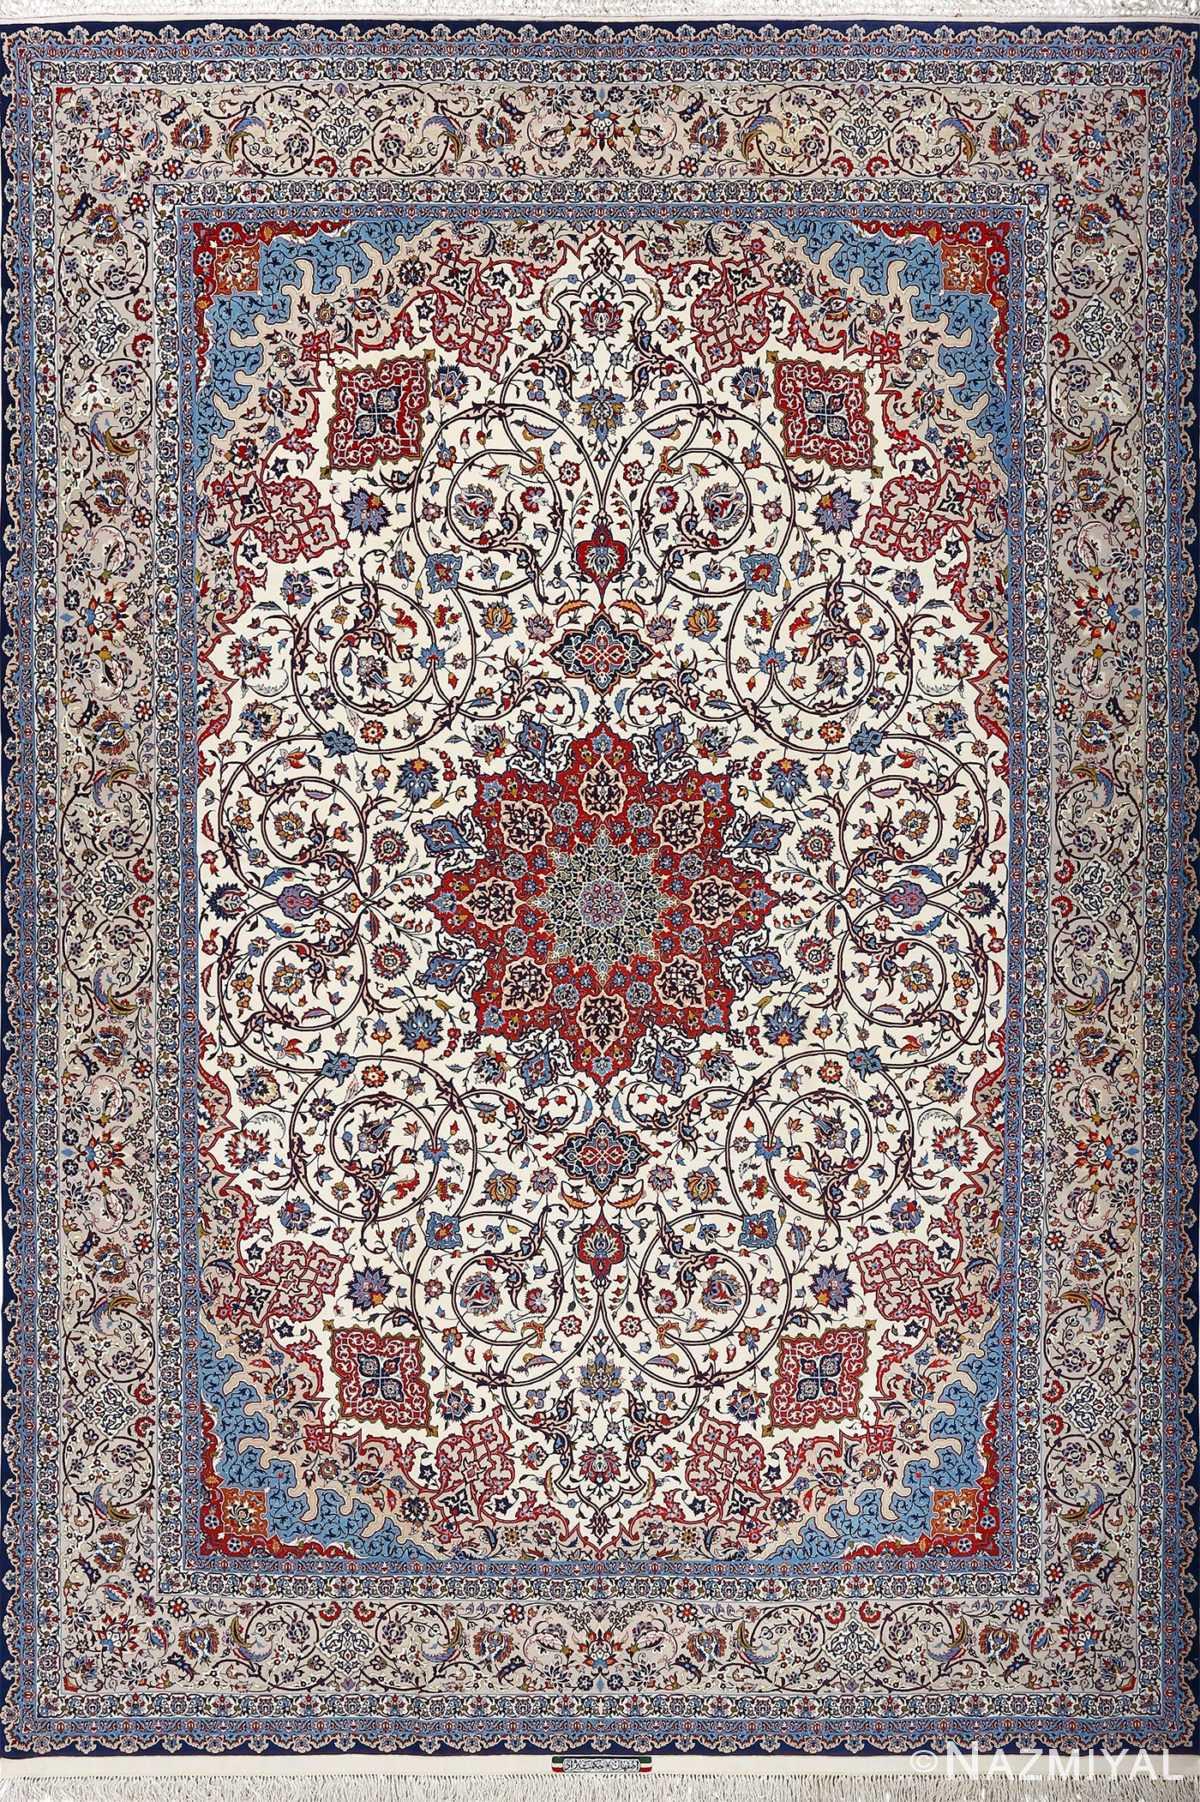 fine hekmatenejad vintage isfahan persian rug 51019 Nazmiyal